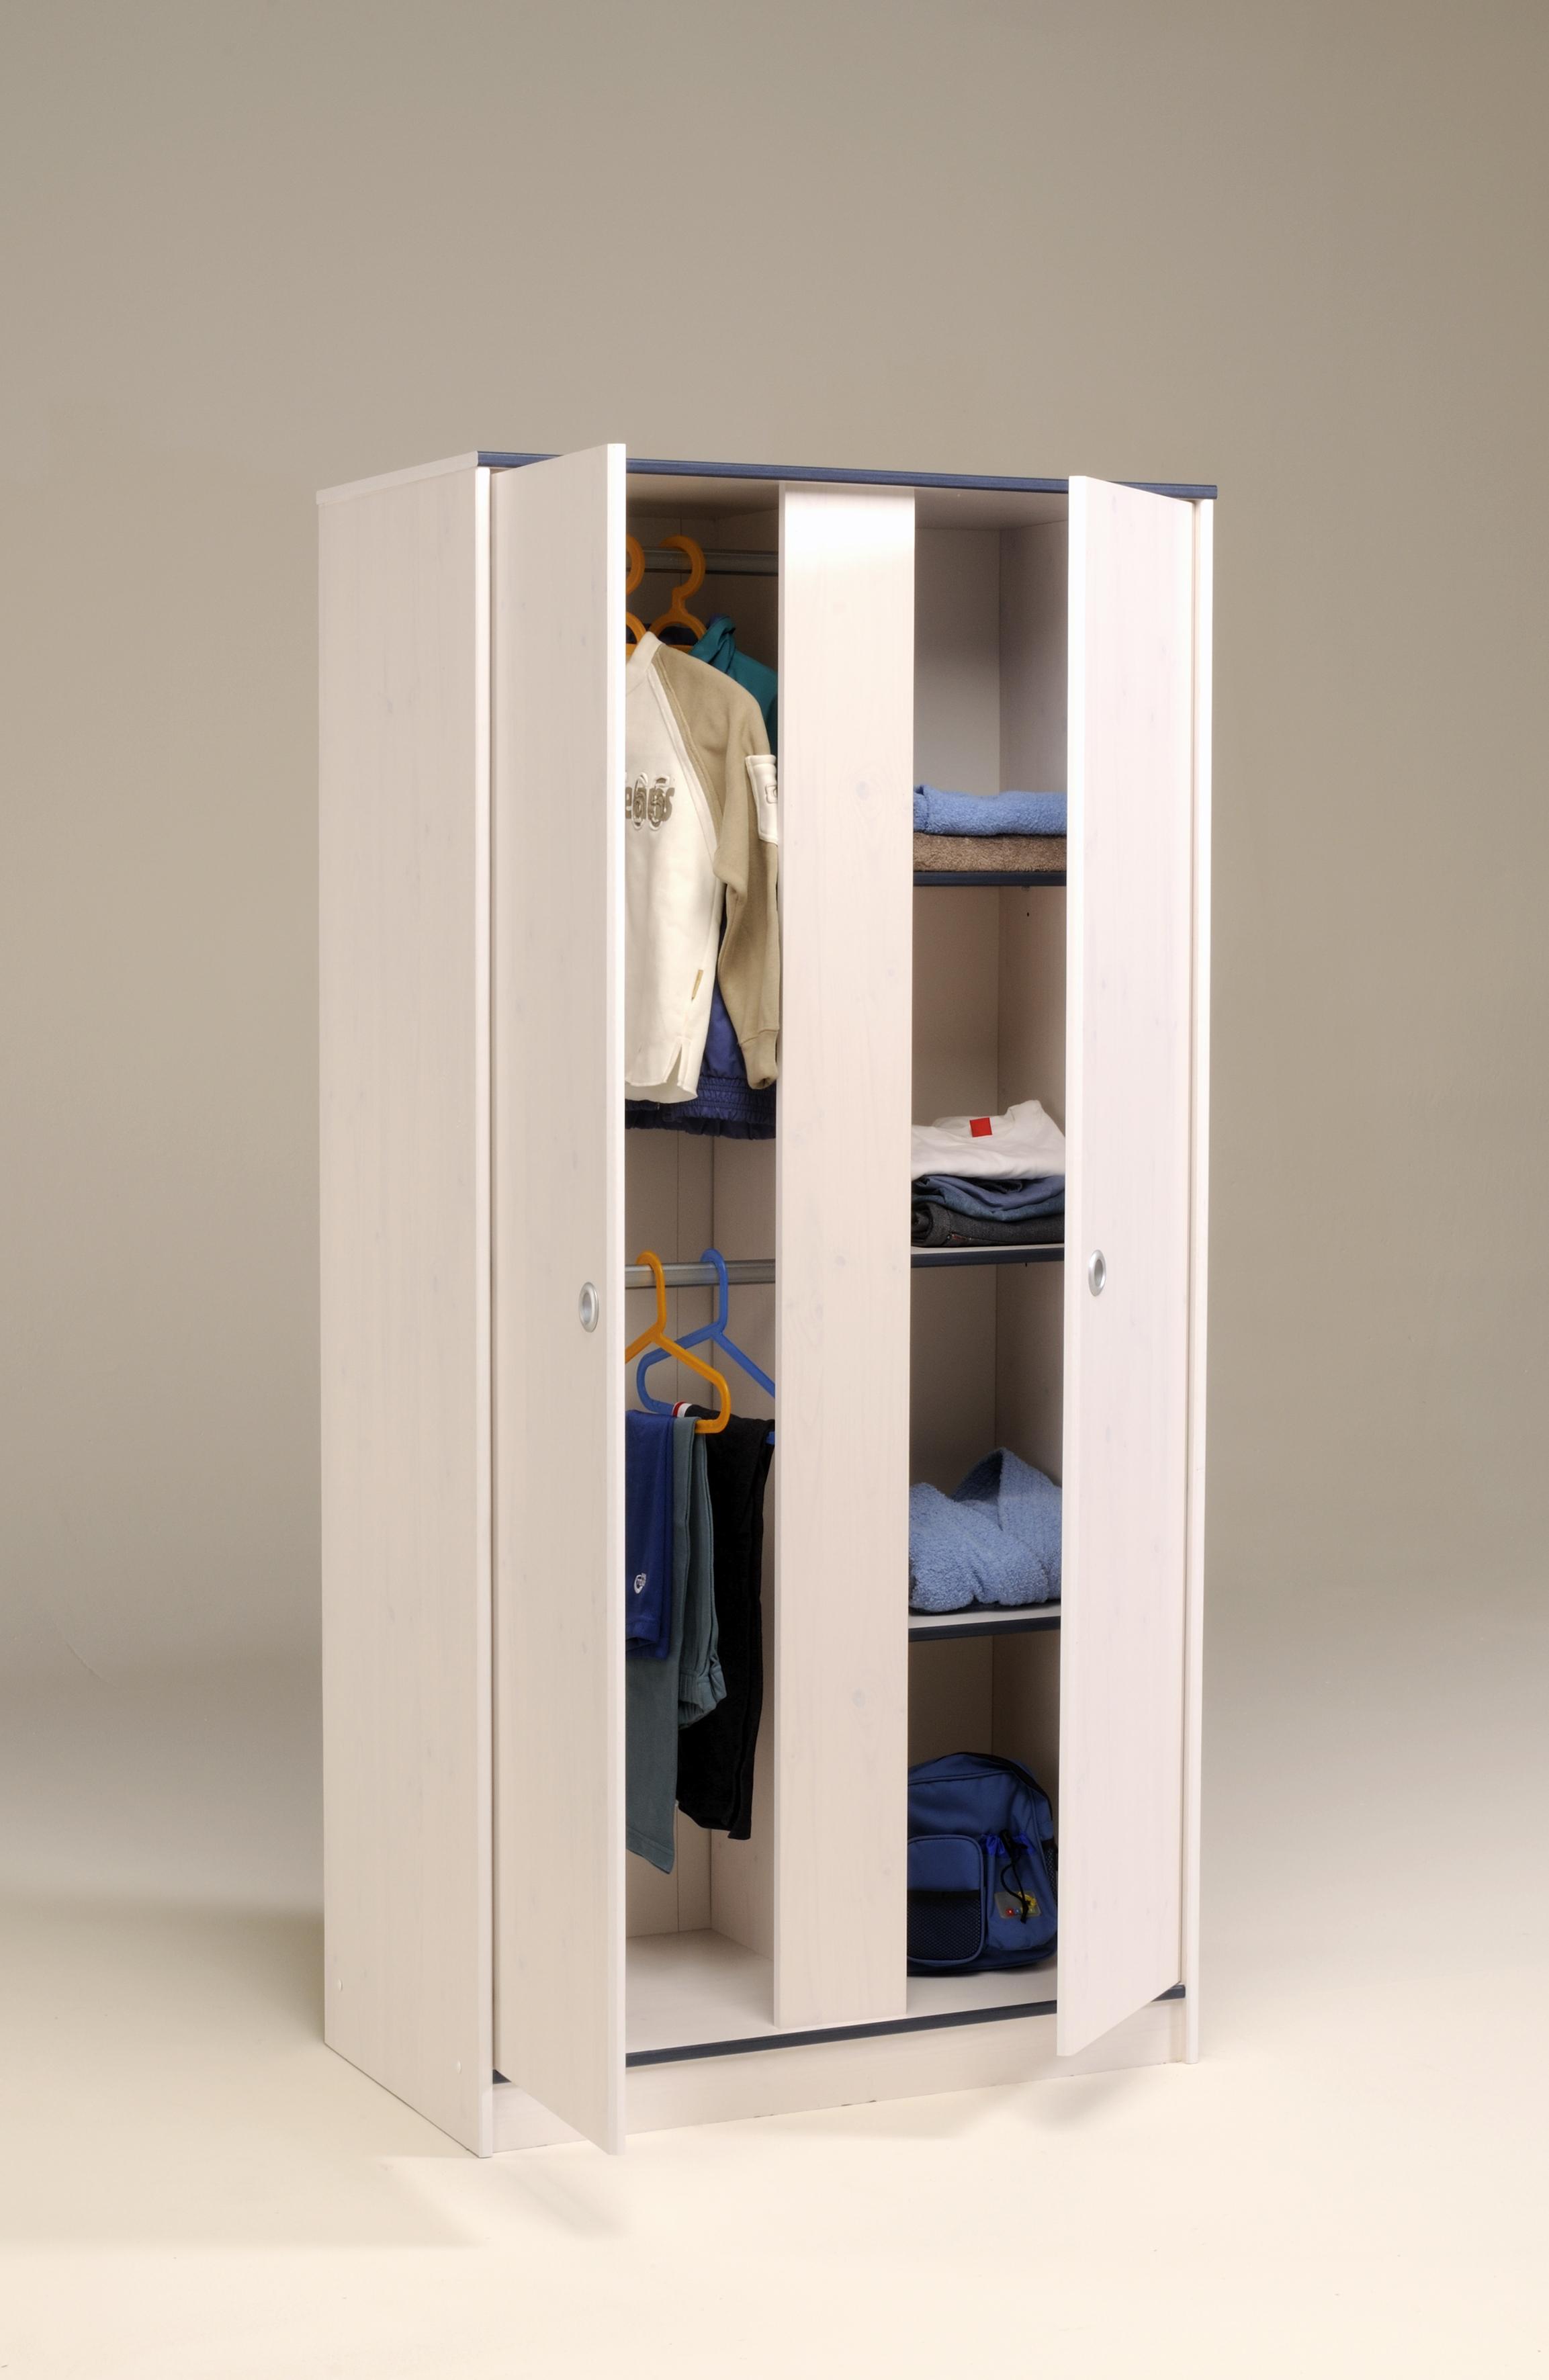 kleiderschrank smoozy11. Black Bedroom Furniture Sets. Home Design Ideas